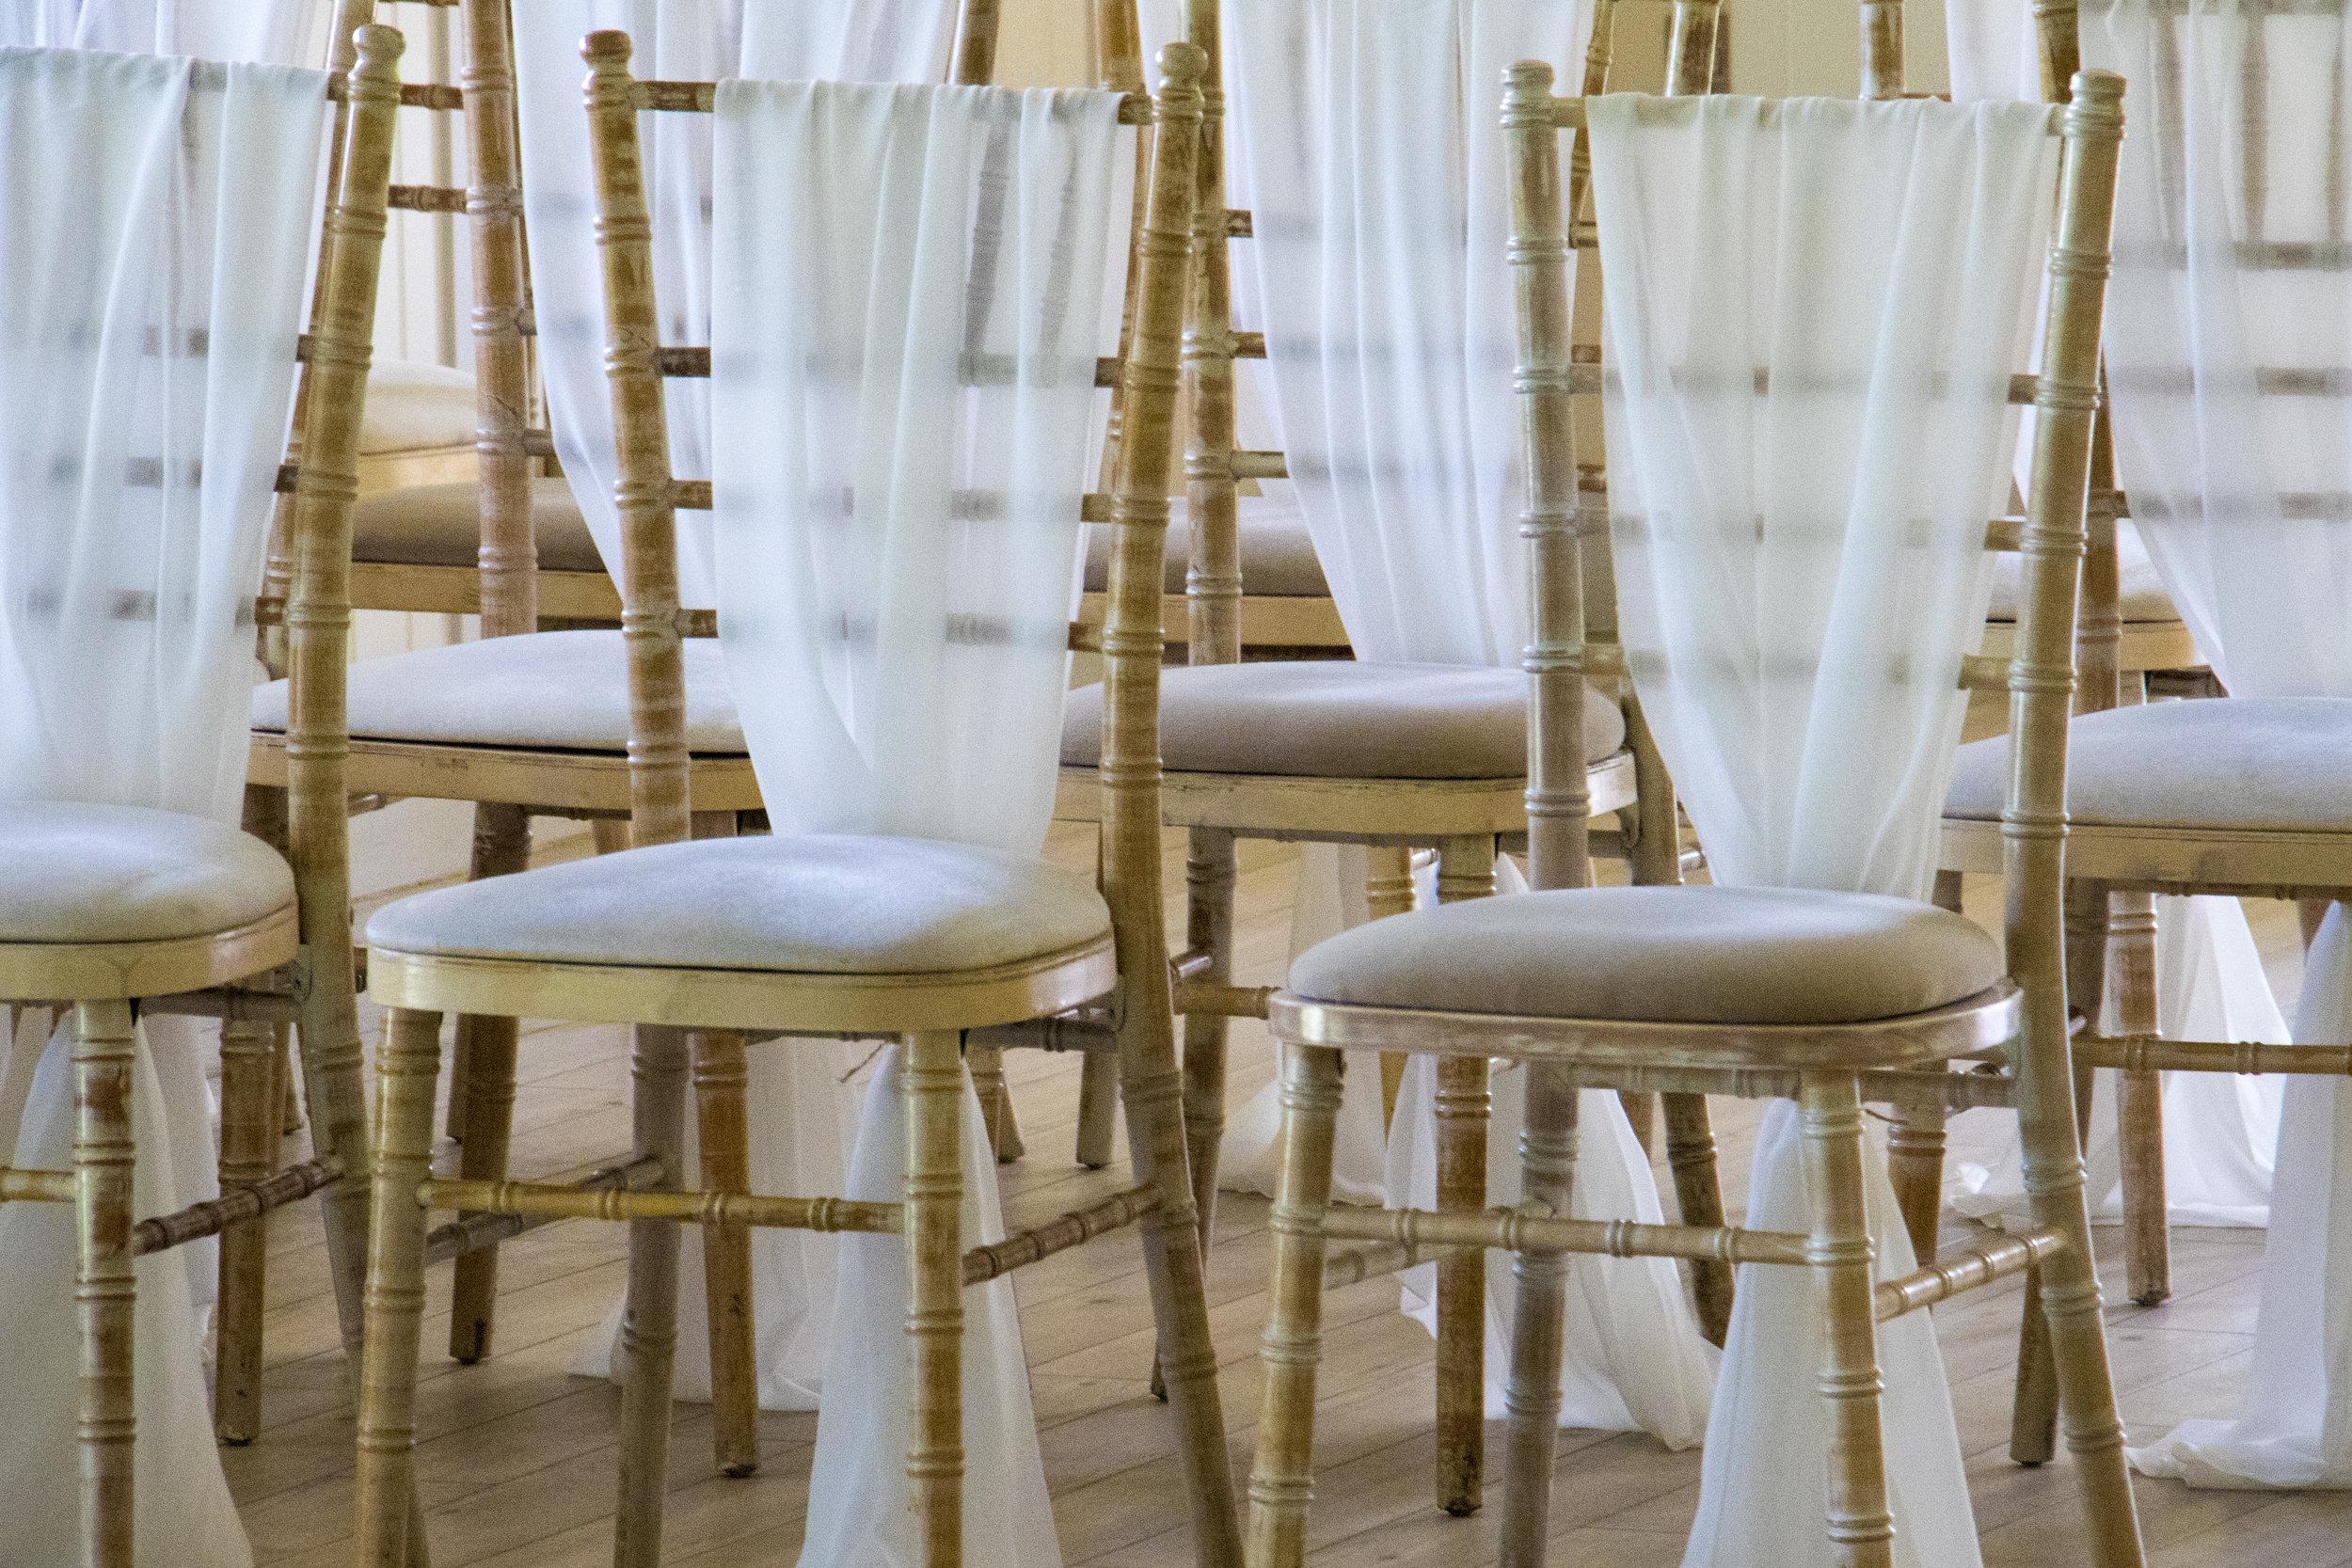 Elegant Chairs - Chivari Chairs, Vintage Chairs, Brentwood Chairs, Napoleon Chairs, President Chairs